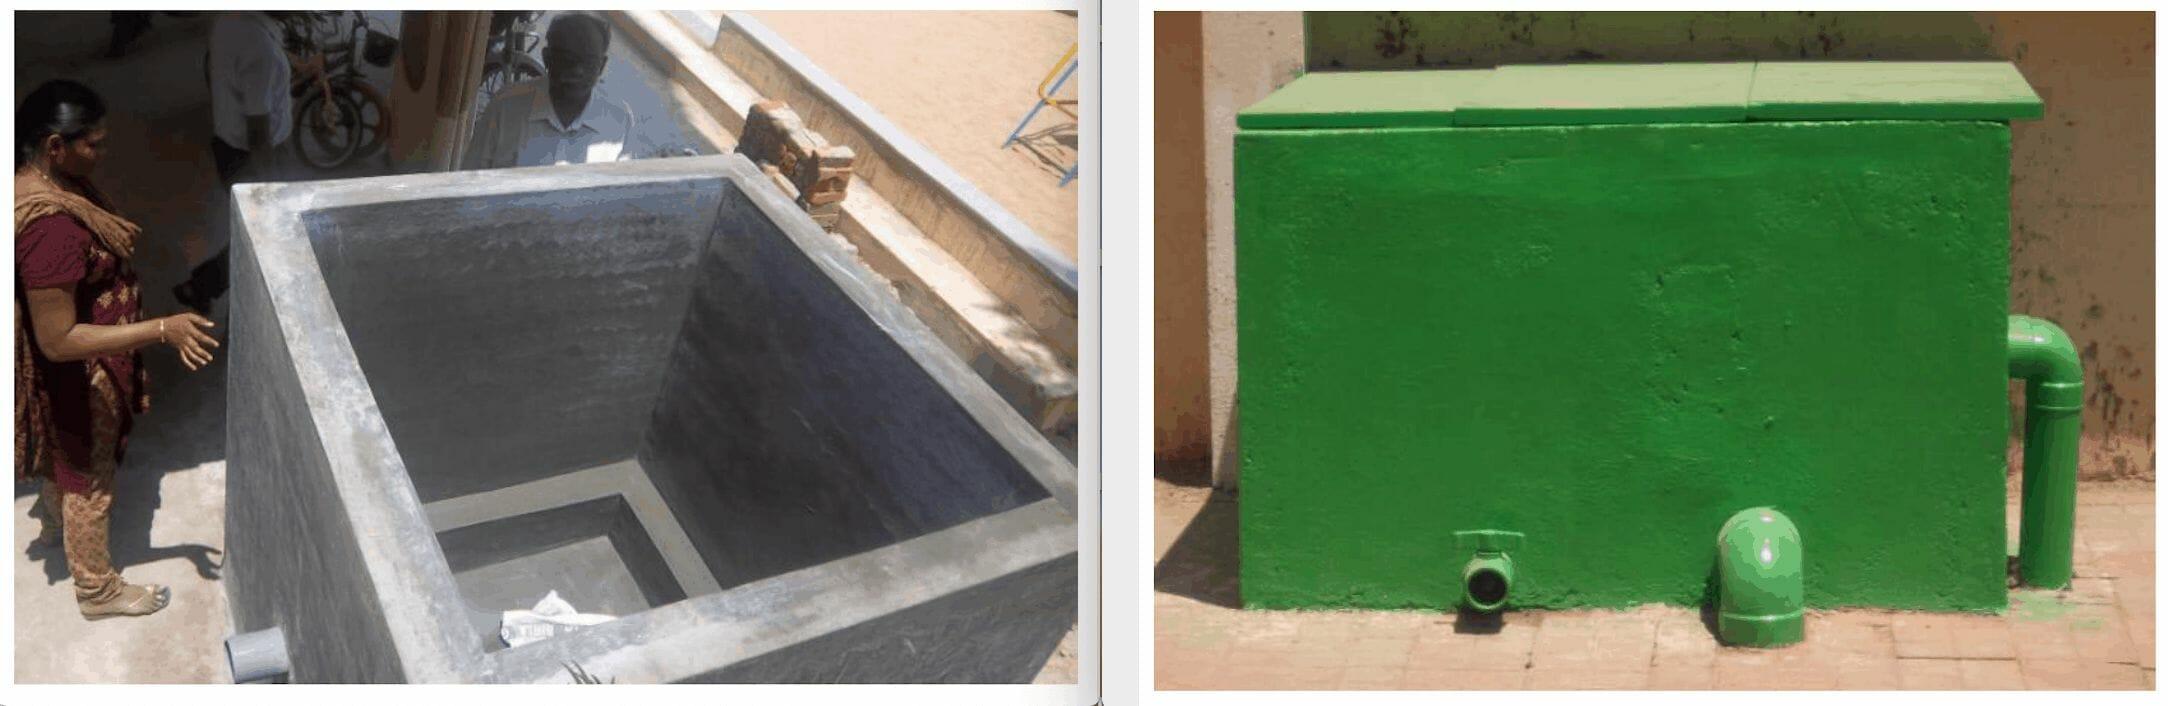 Rainwater harvesting filter unit.